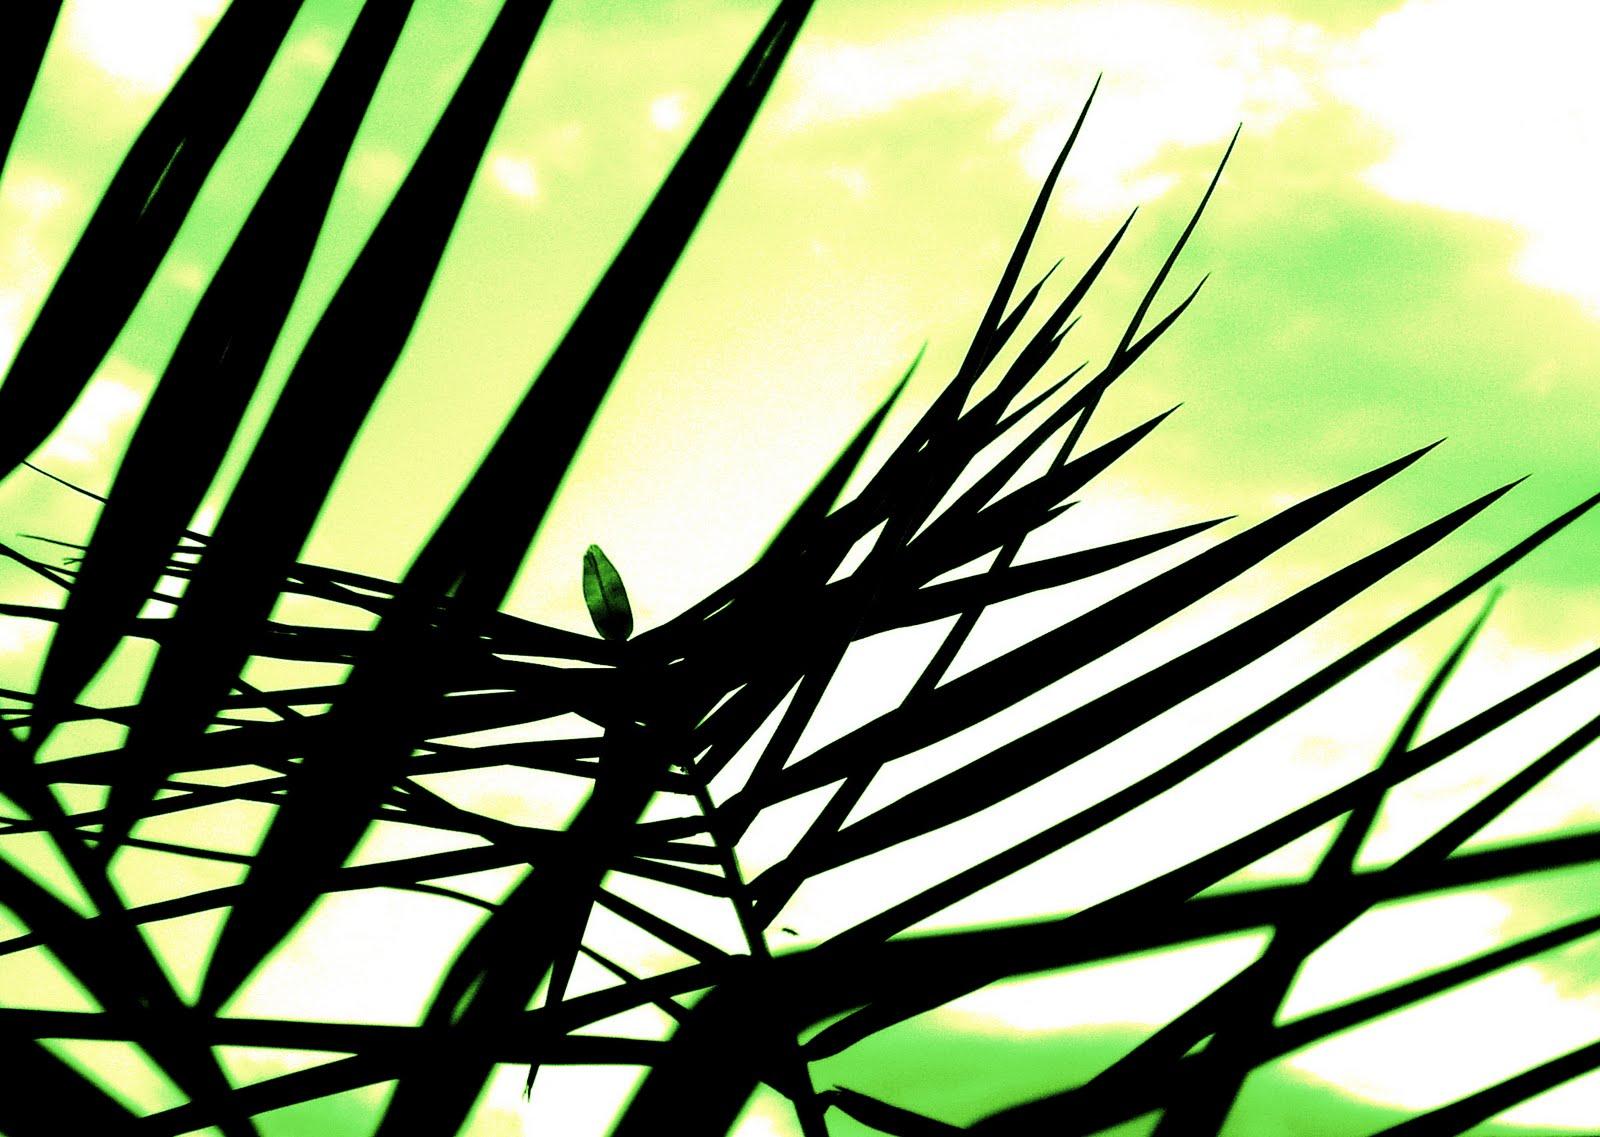 Nikos palm passion sunday prayer march 28 for Prayer palm plant